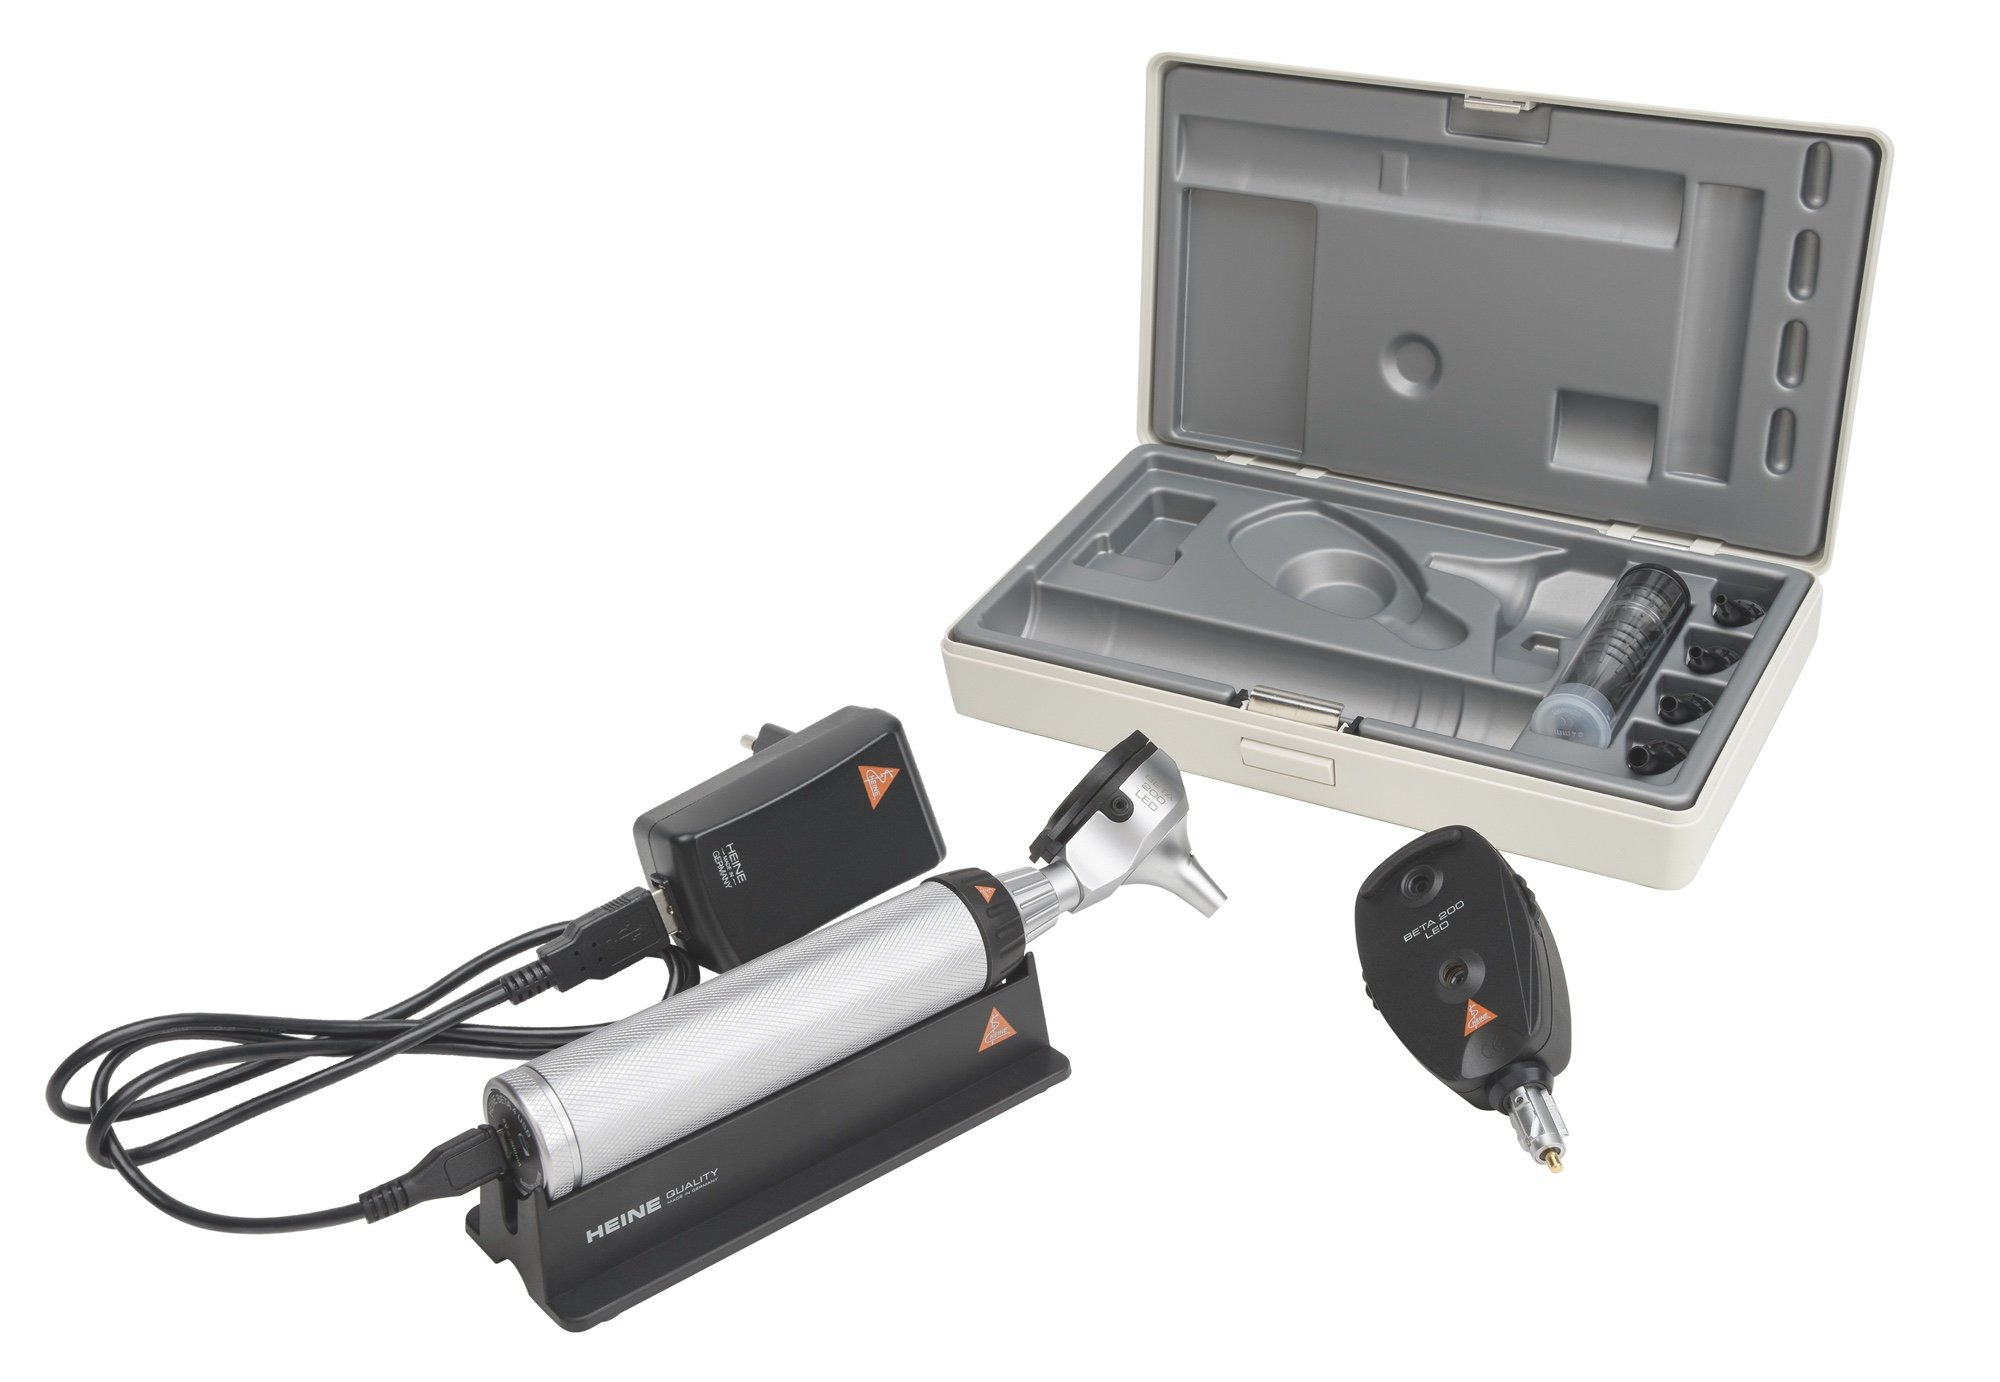 HEINE BETA 200 LED Diagnostic Set with BETA4 USB Rechageable Handle